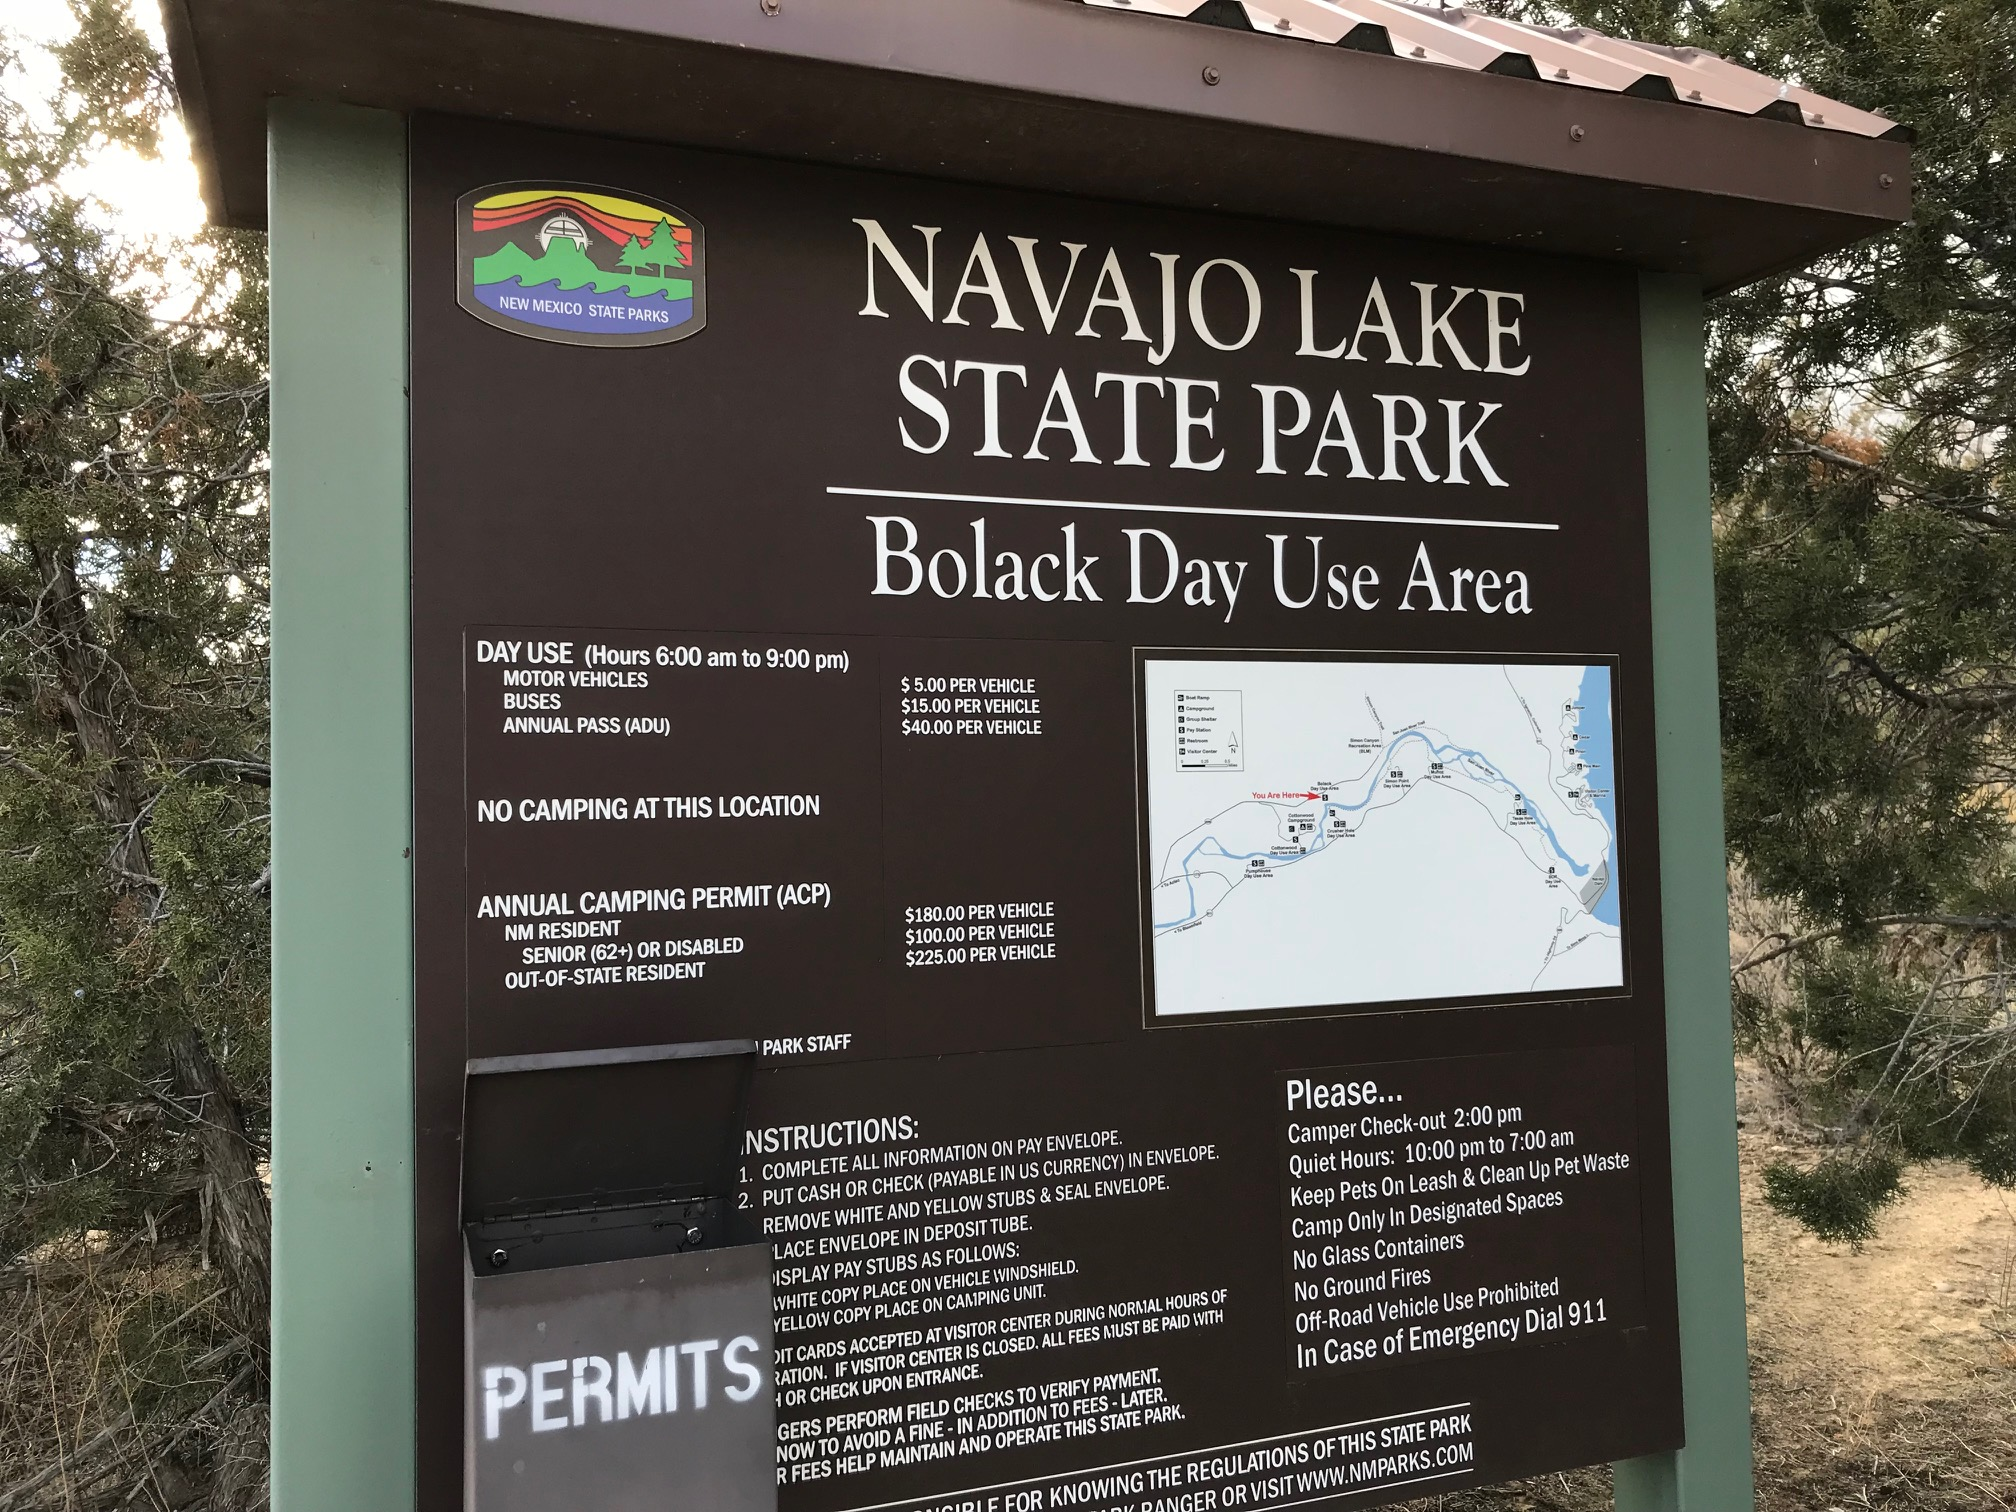 San Juan River Bolack Day Use Area